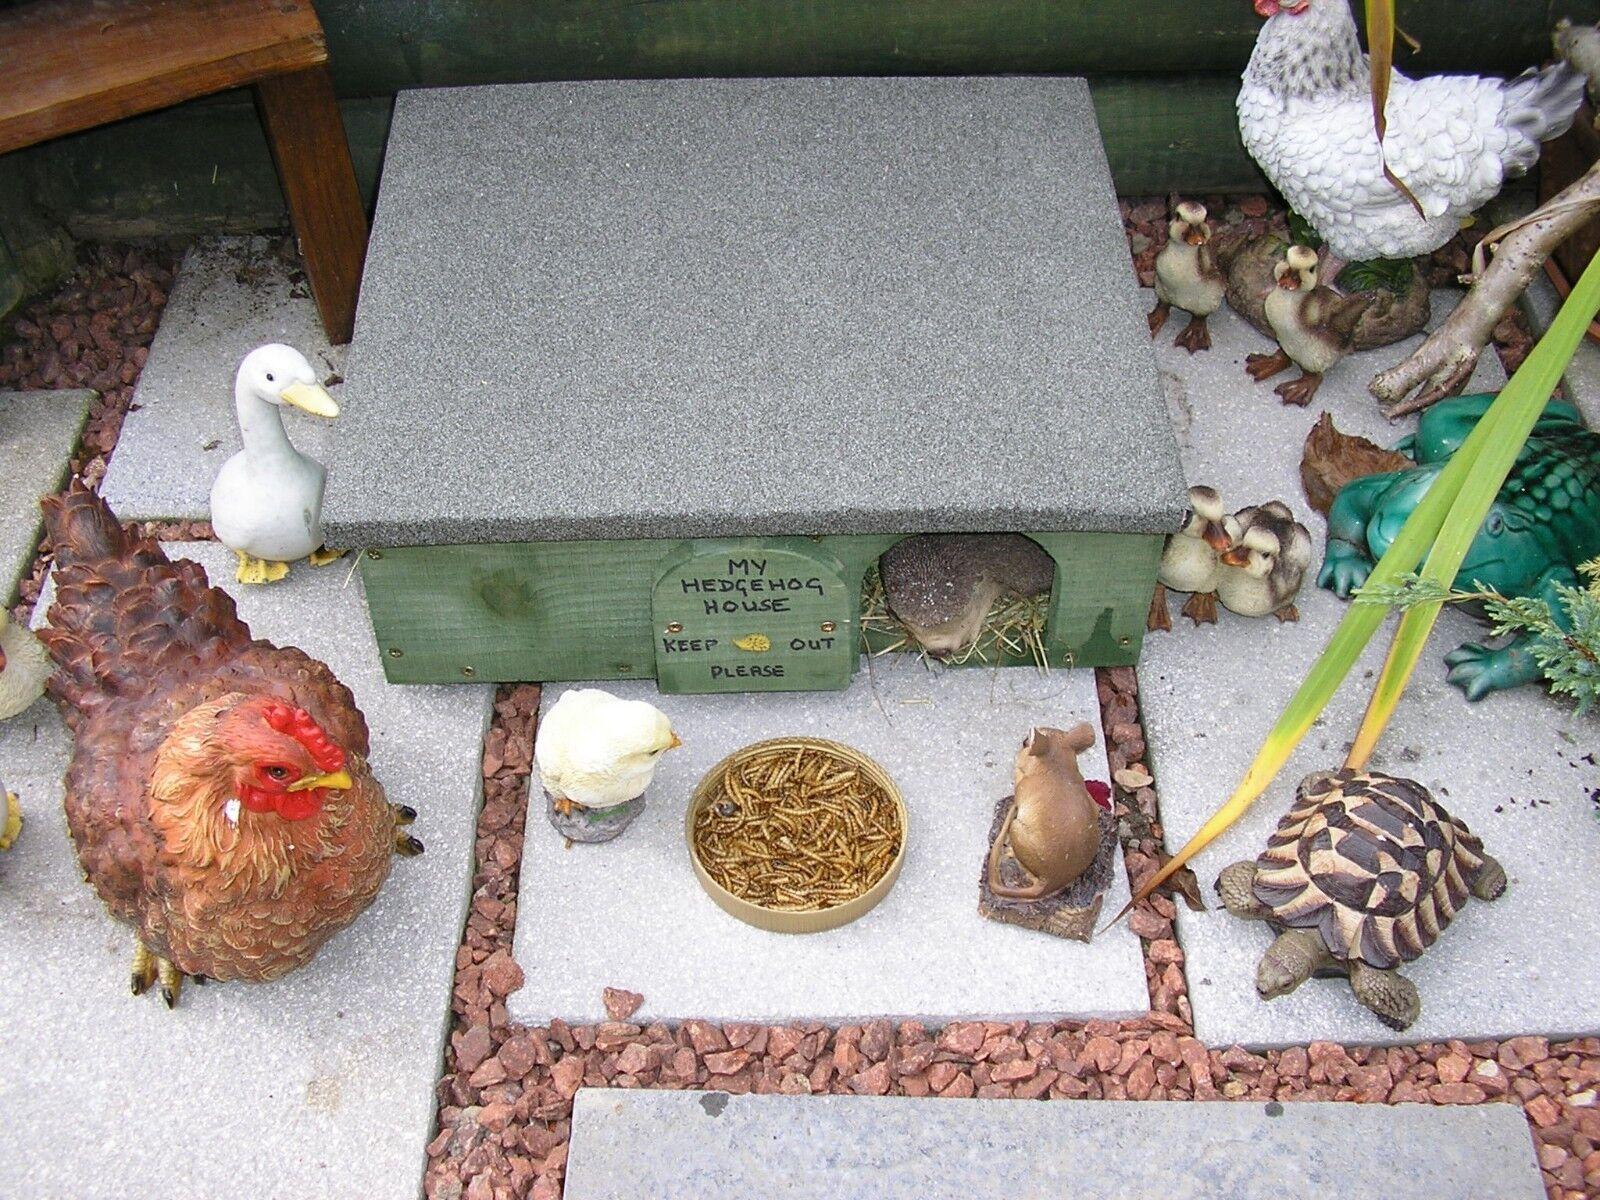 Hedgehog House Hibernation Feeding And Breeding Box Wooden Green